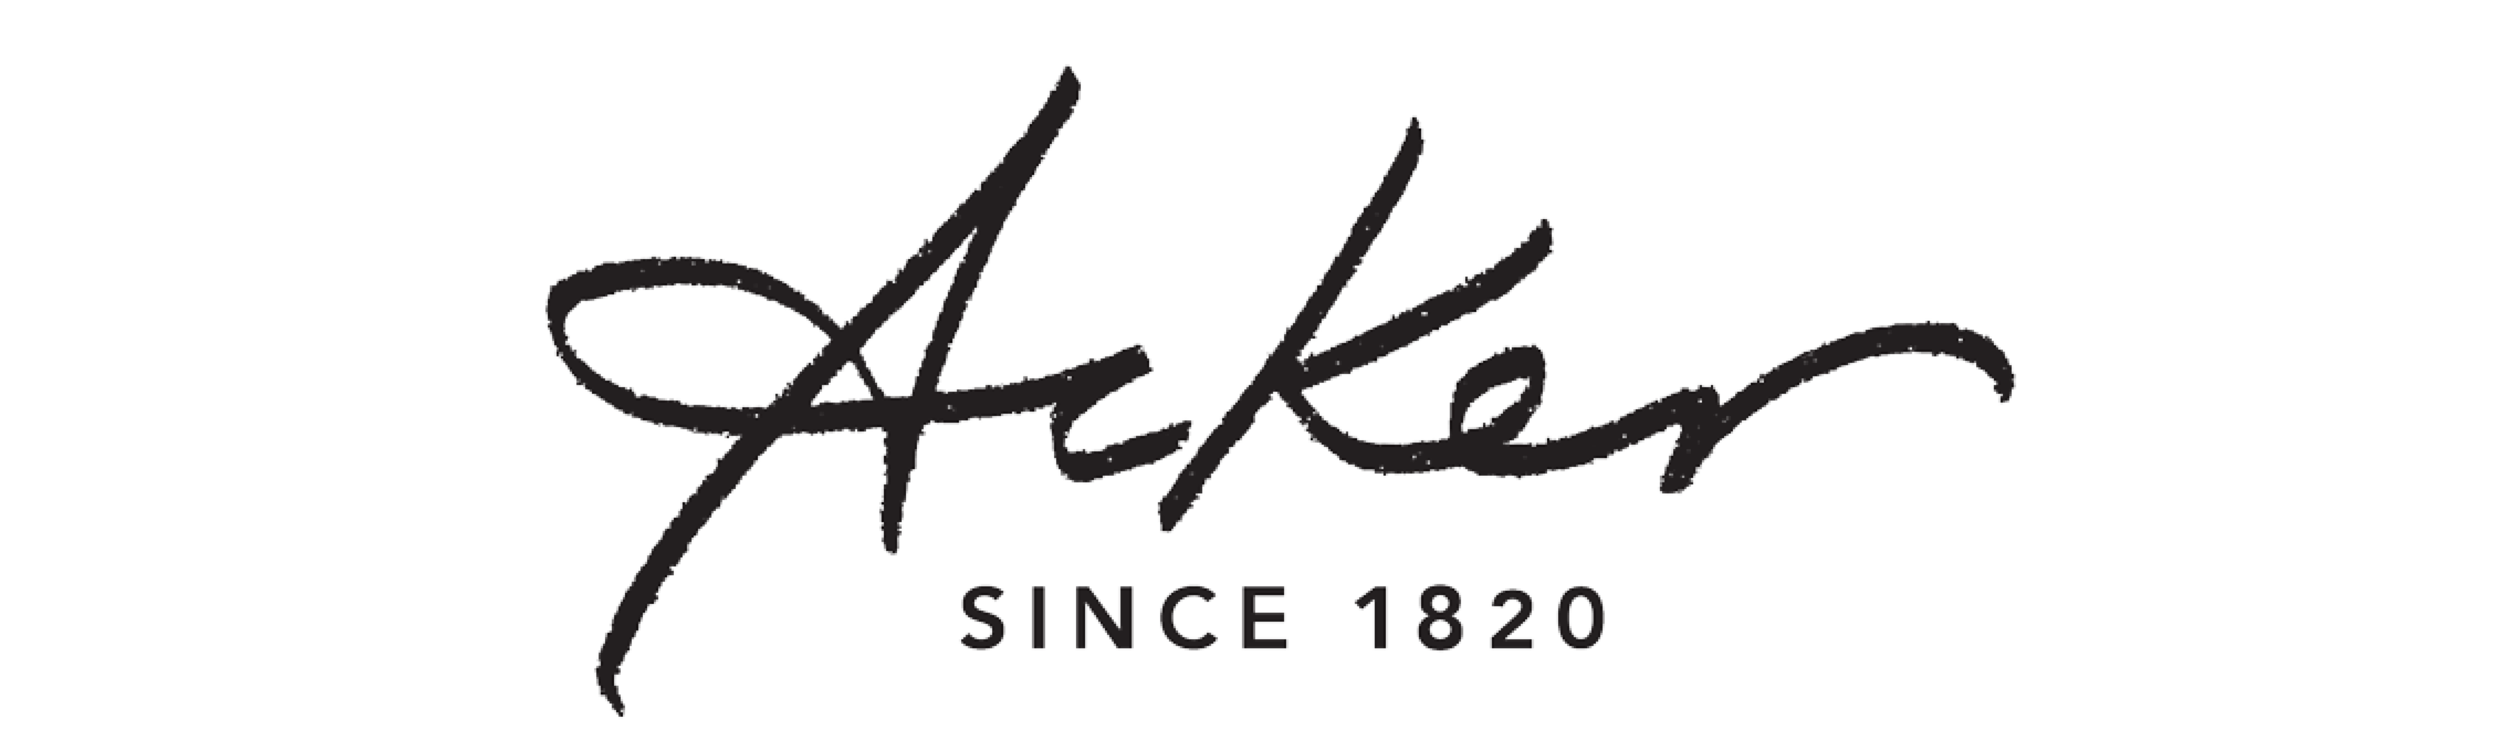 Acker_Logo_CellerArts-01.png